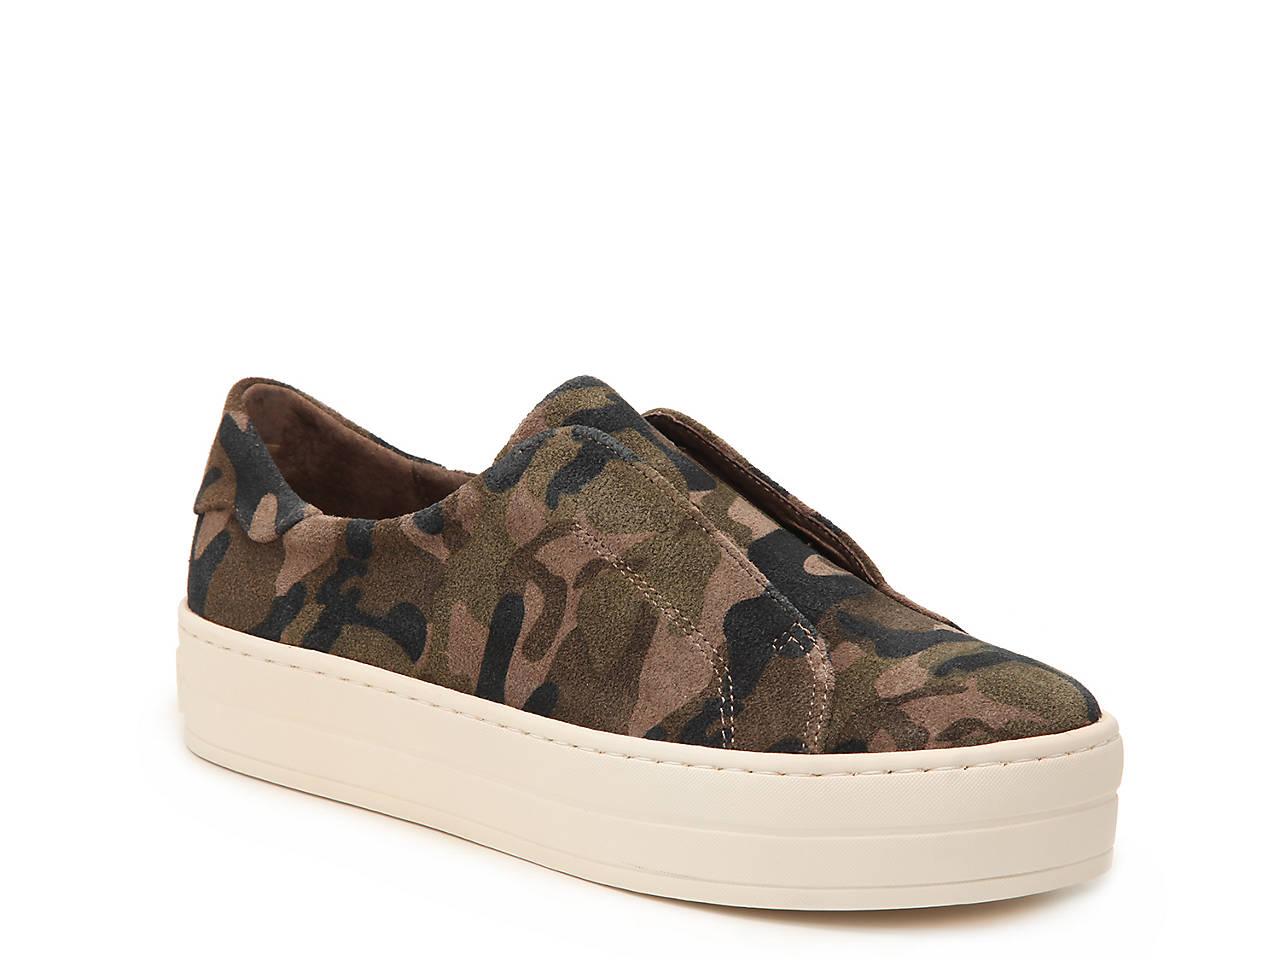 ea1c36d98bd8f J Slides Heidi Platform Slip-On Sneaker Women's Shoes | DSW